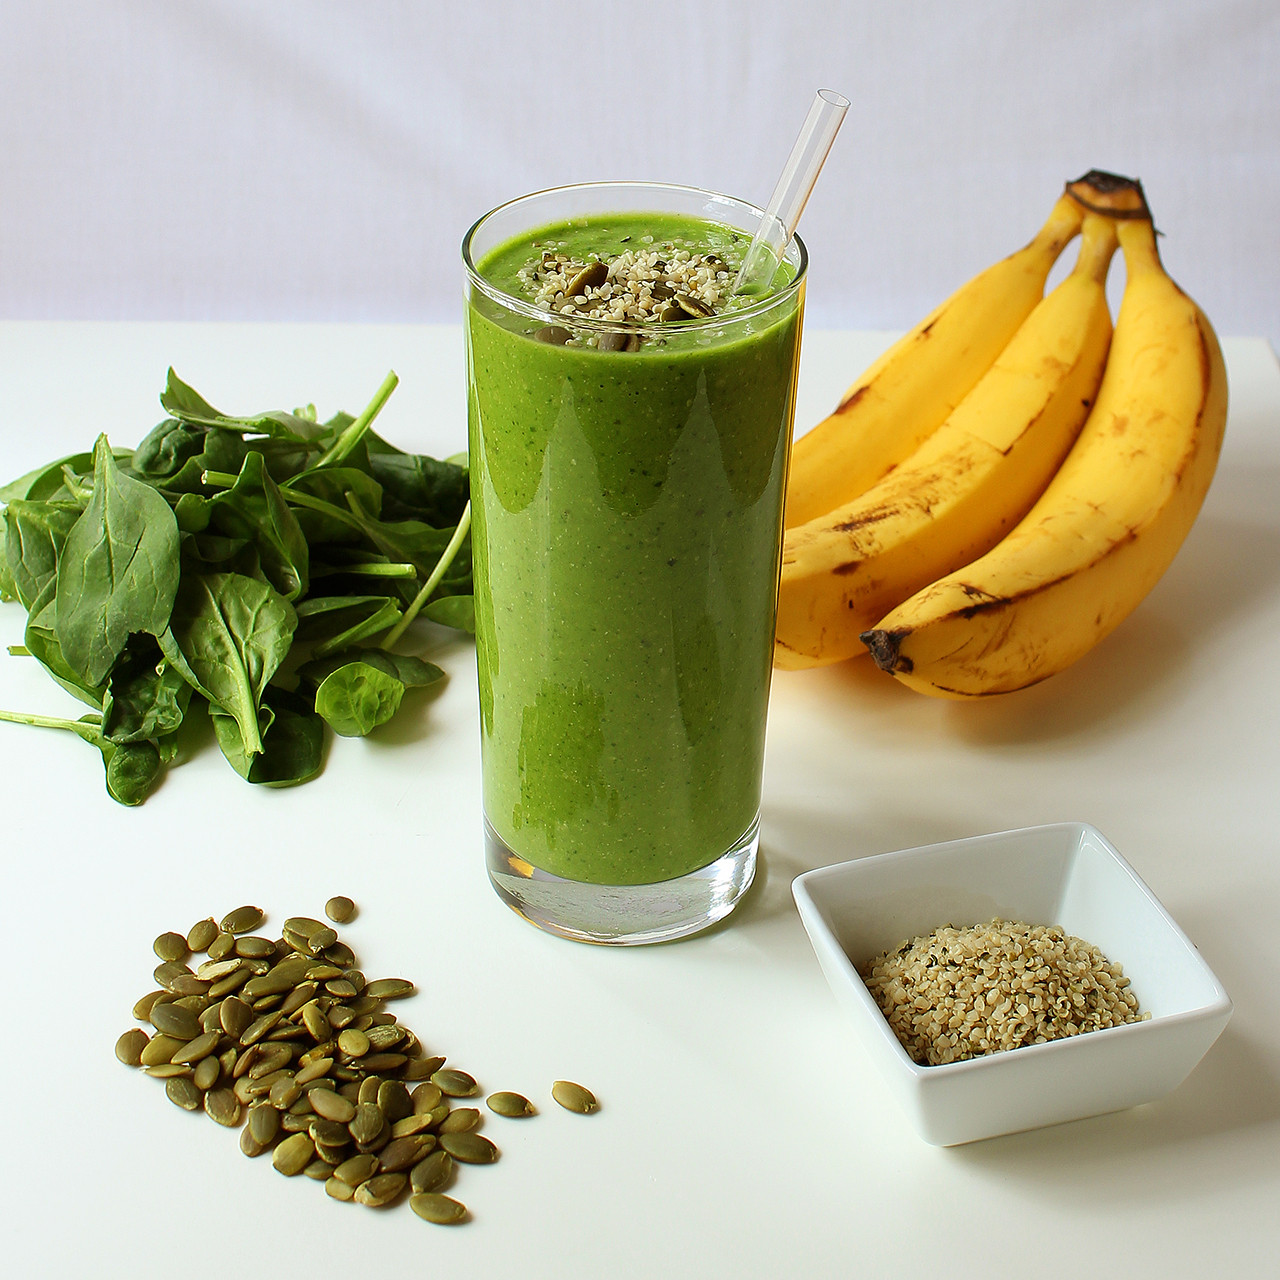 Healthy Vegan Smoothies  Green Protein Power Breakfast Smoothie I LOVE VEGAN